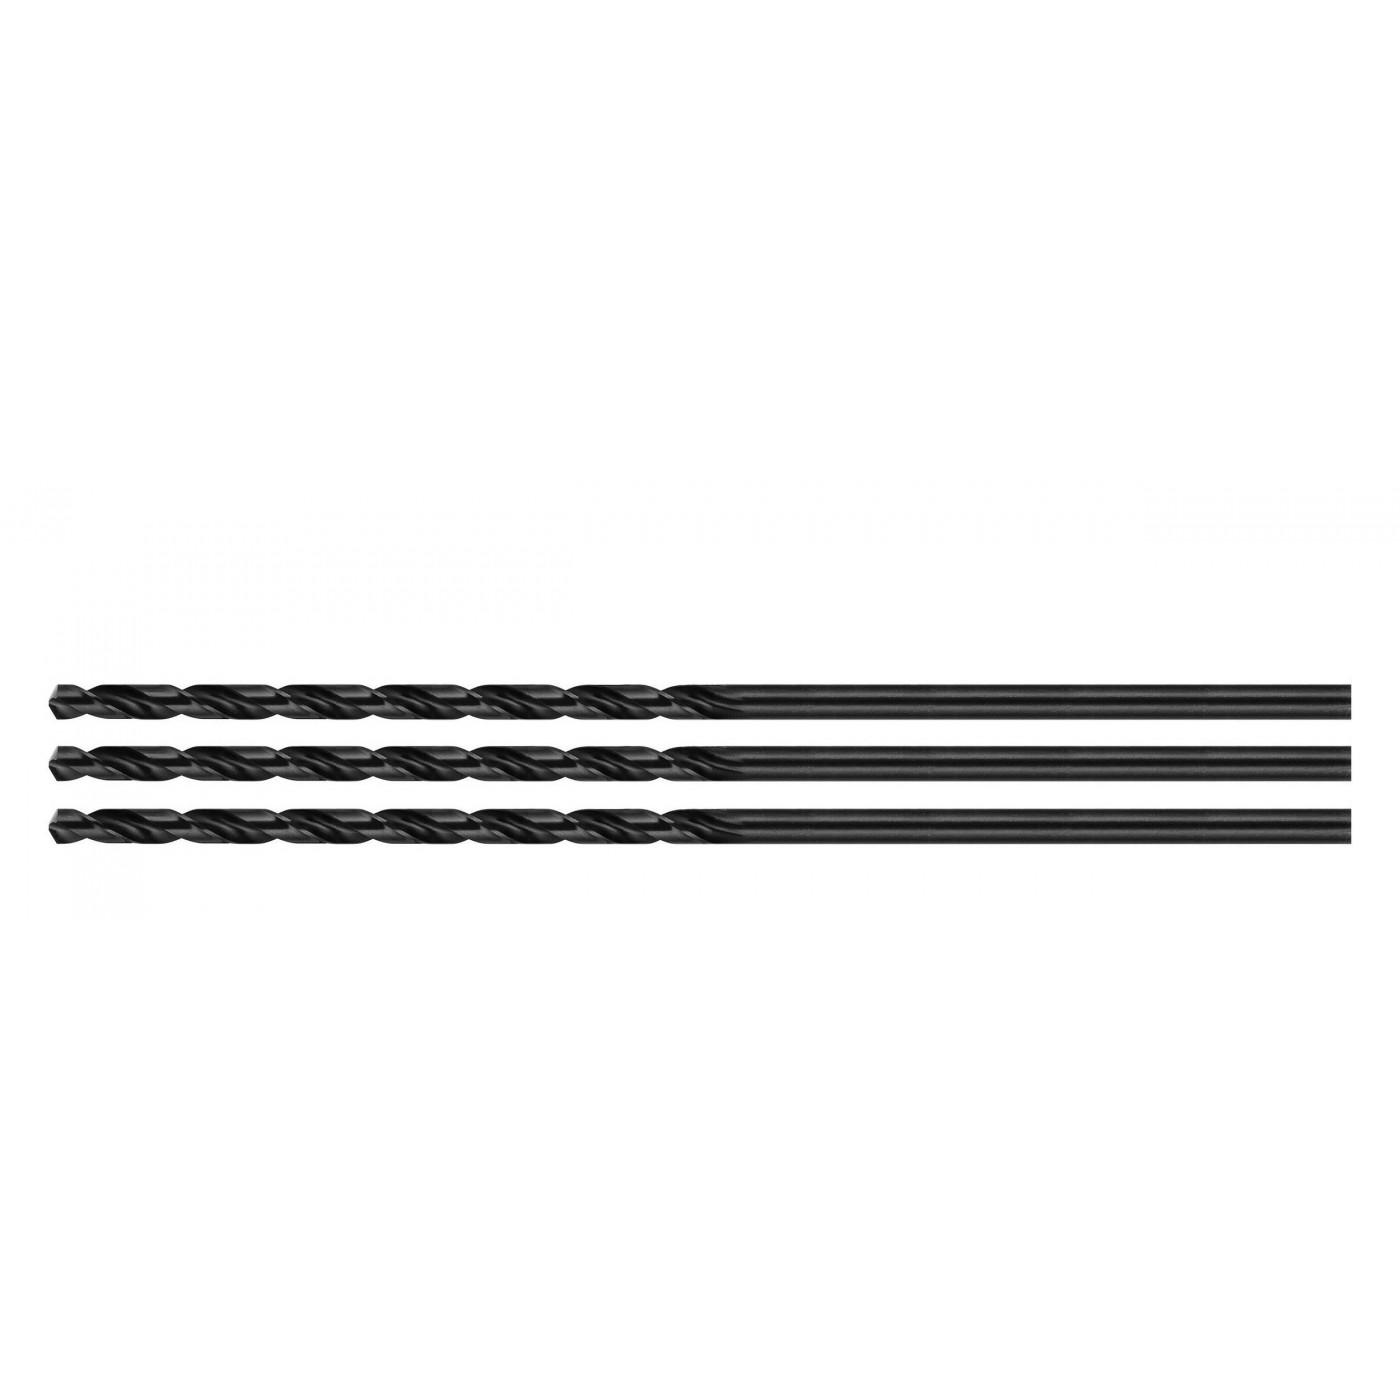 Set of 3 metal drill bits, extra long (8.0x350 mm)